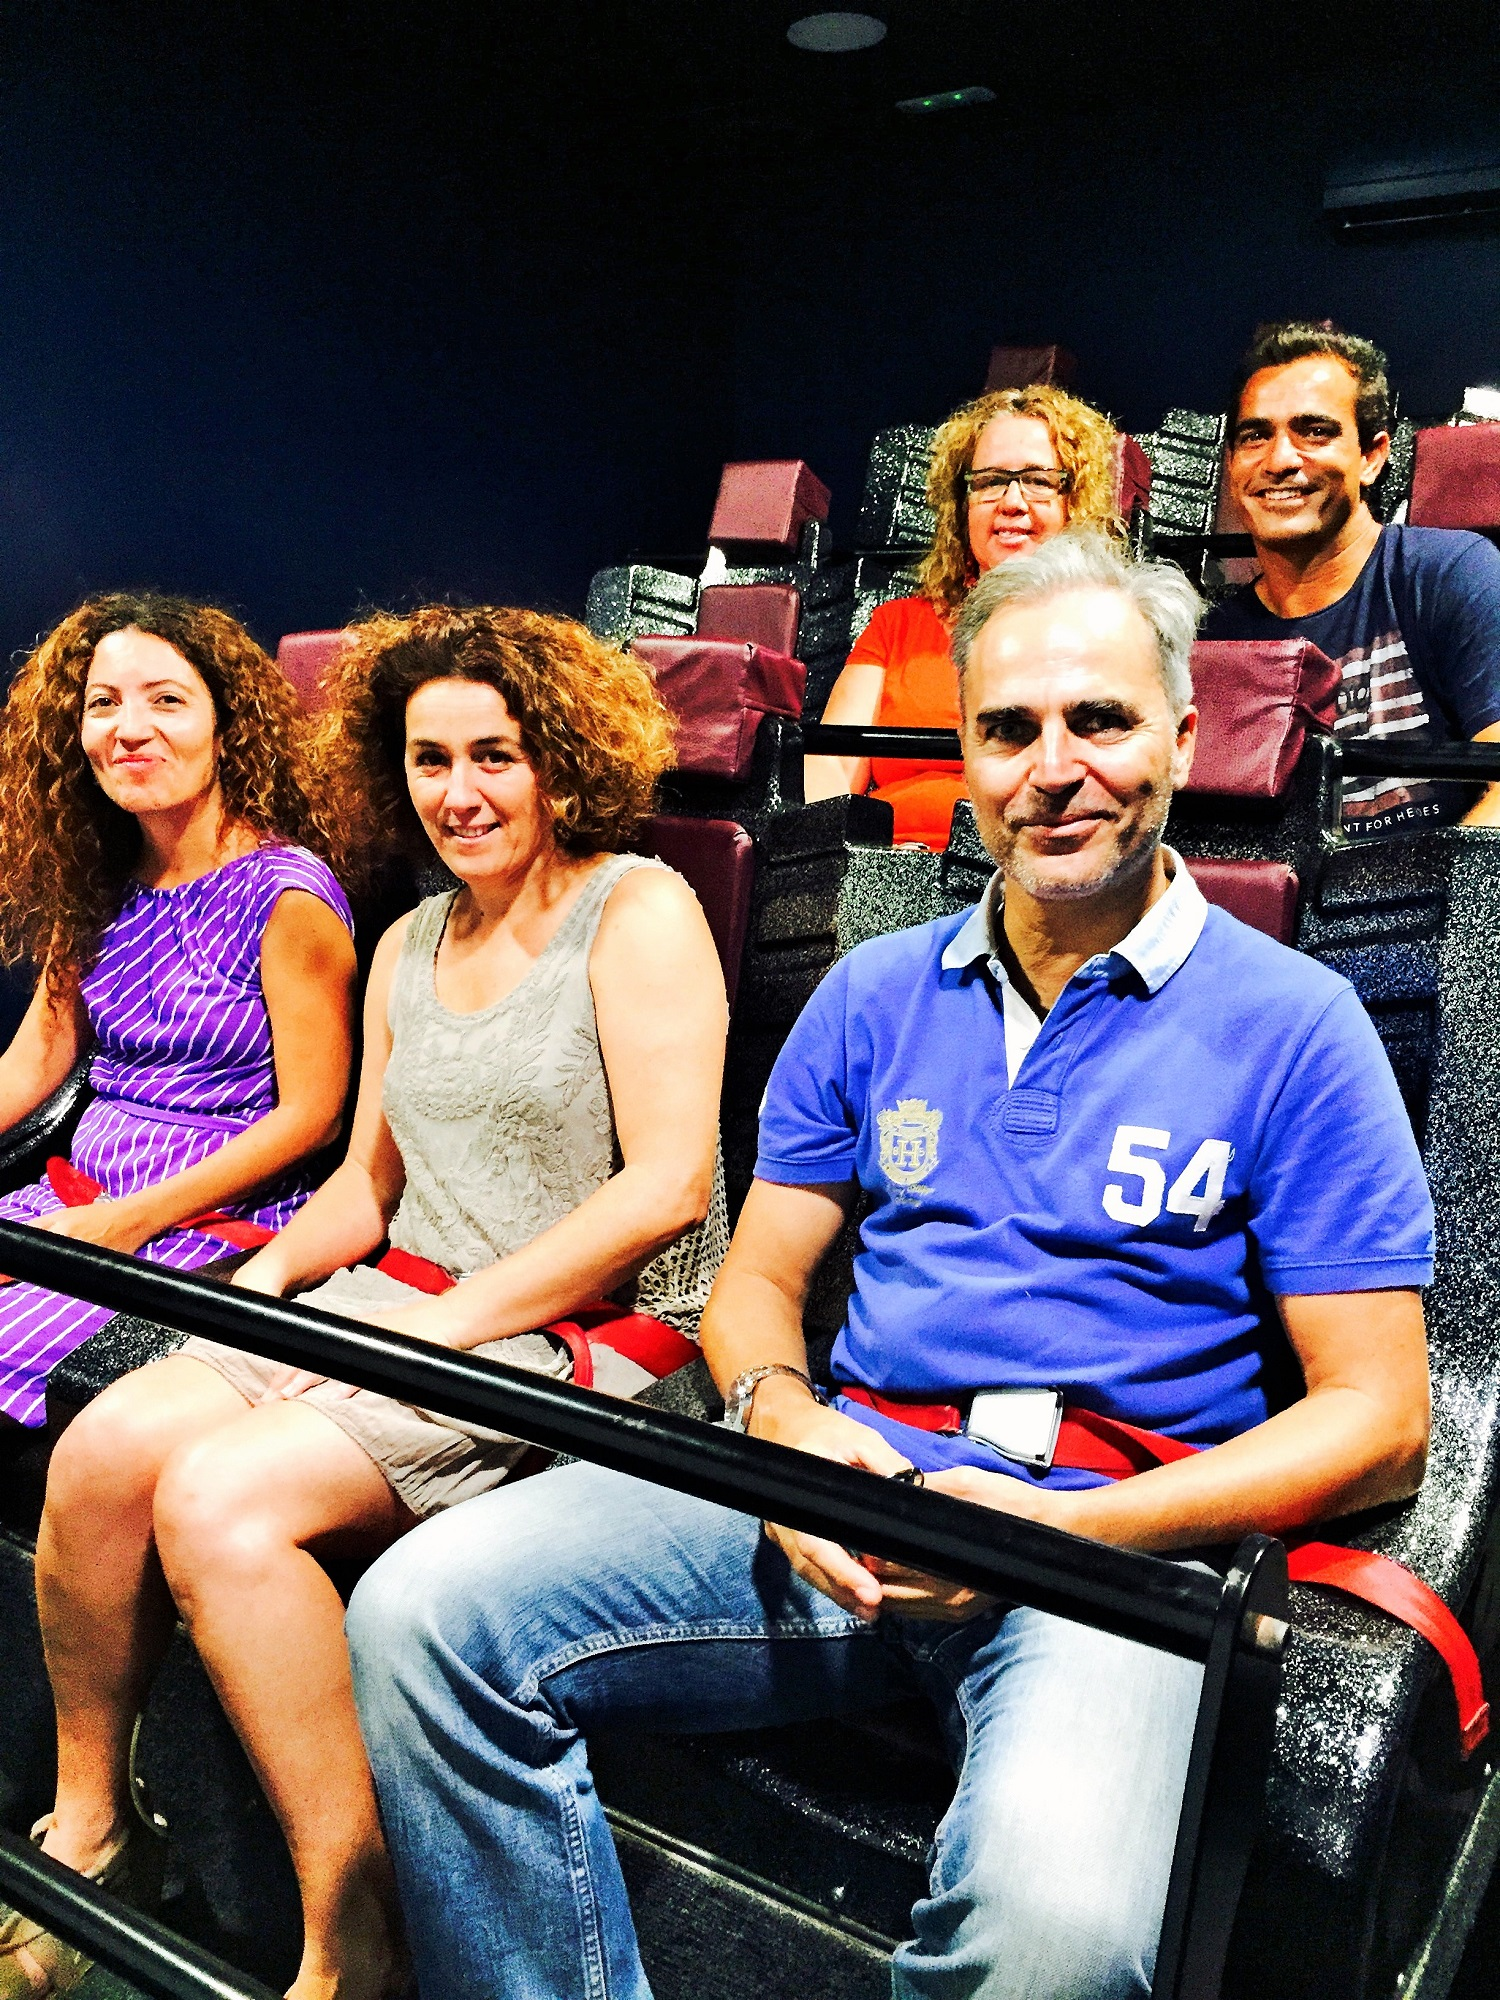 Blogueros en cine 6D